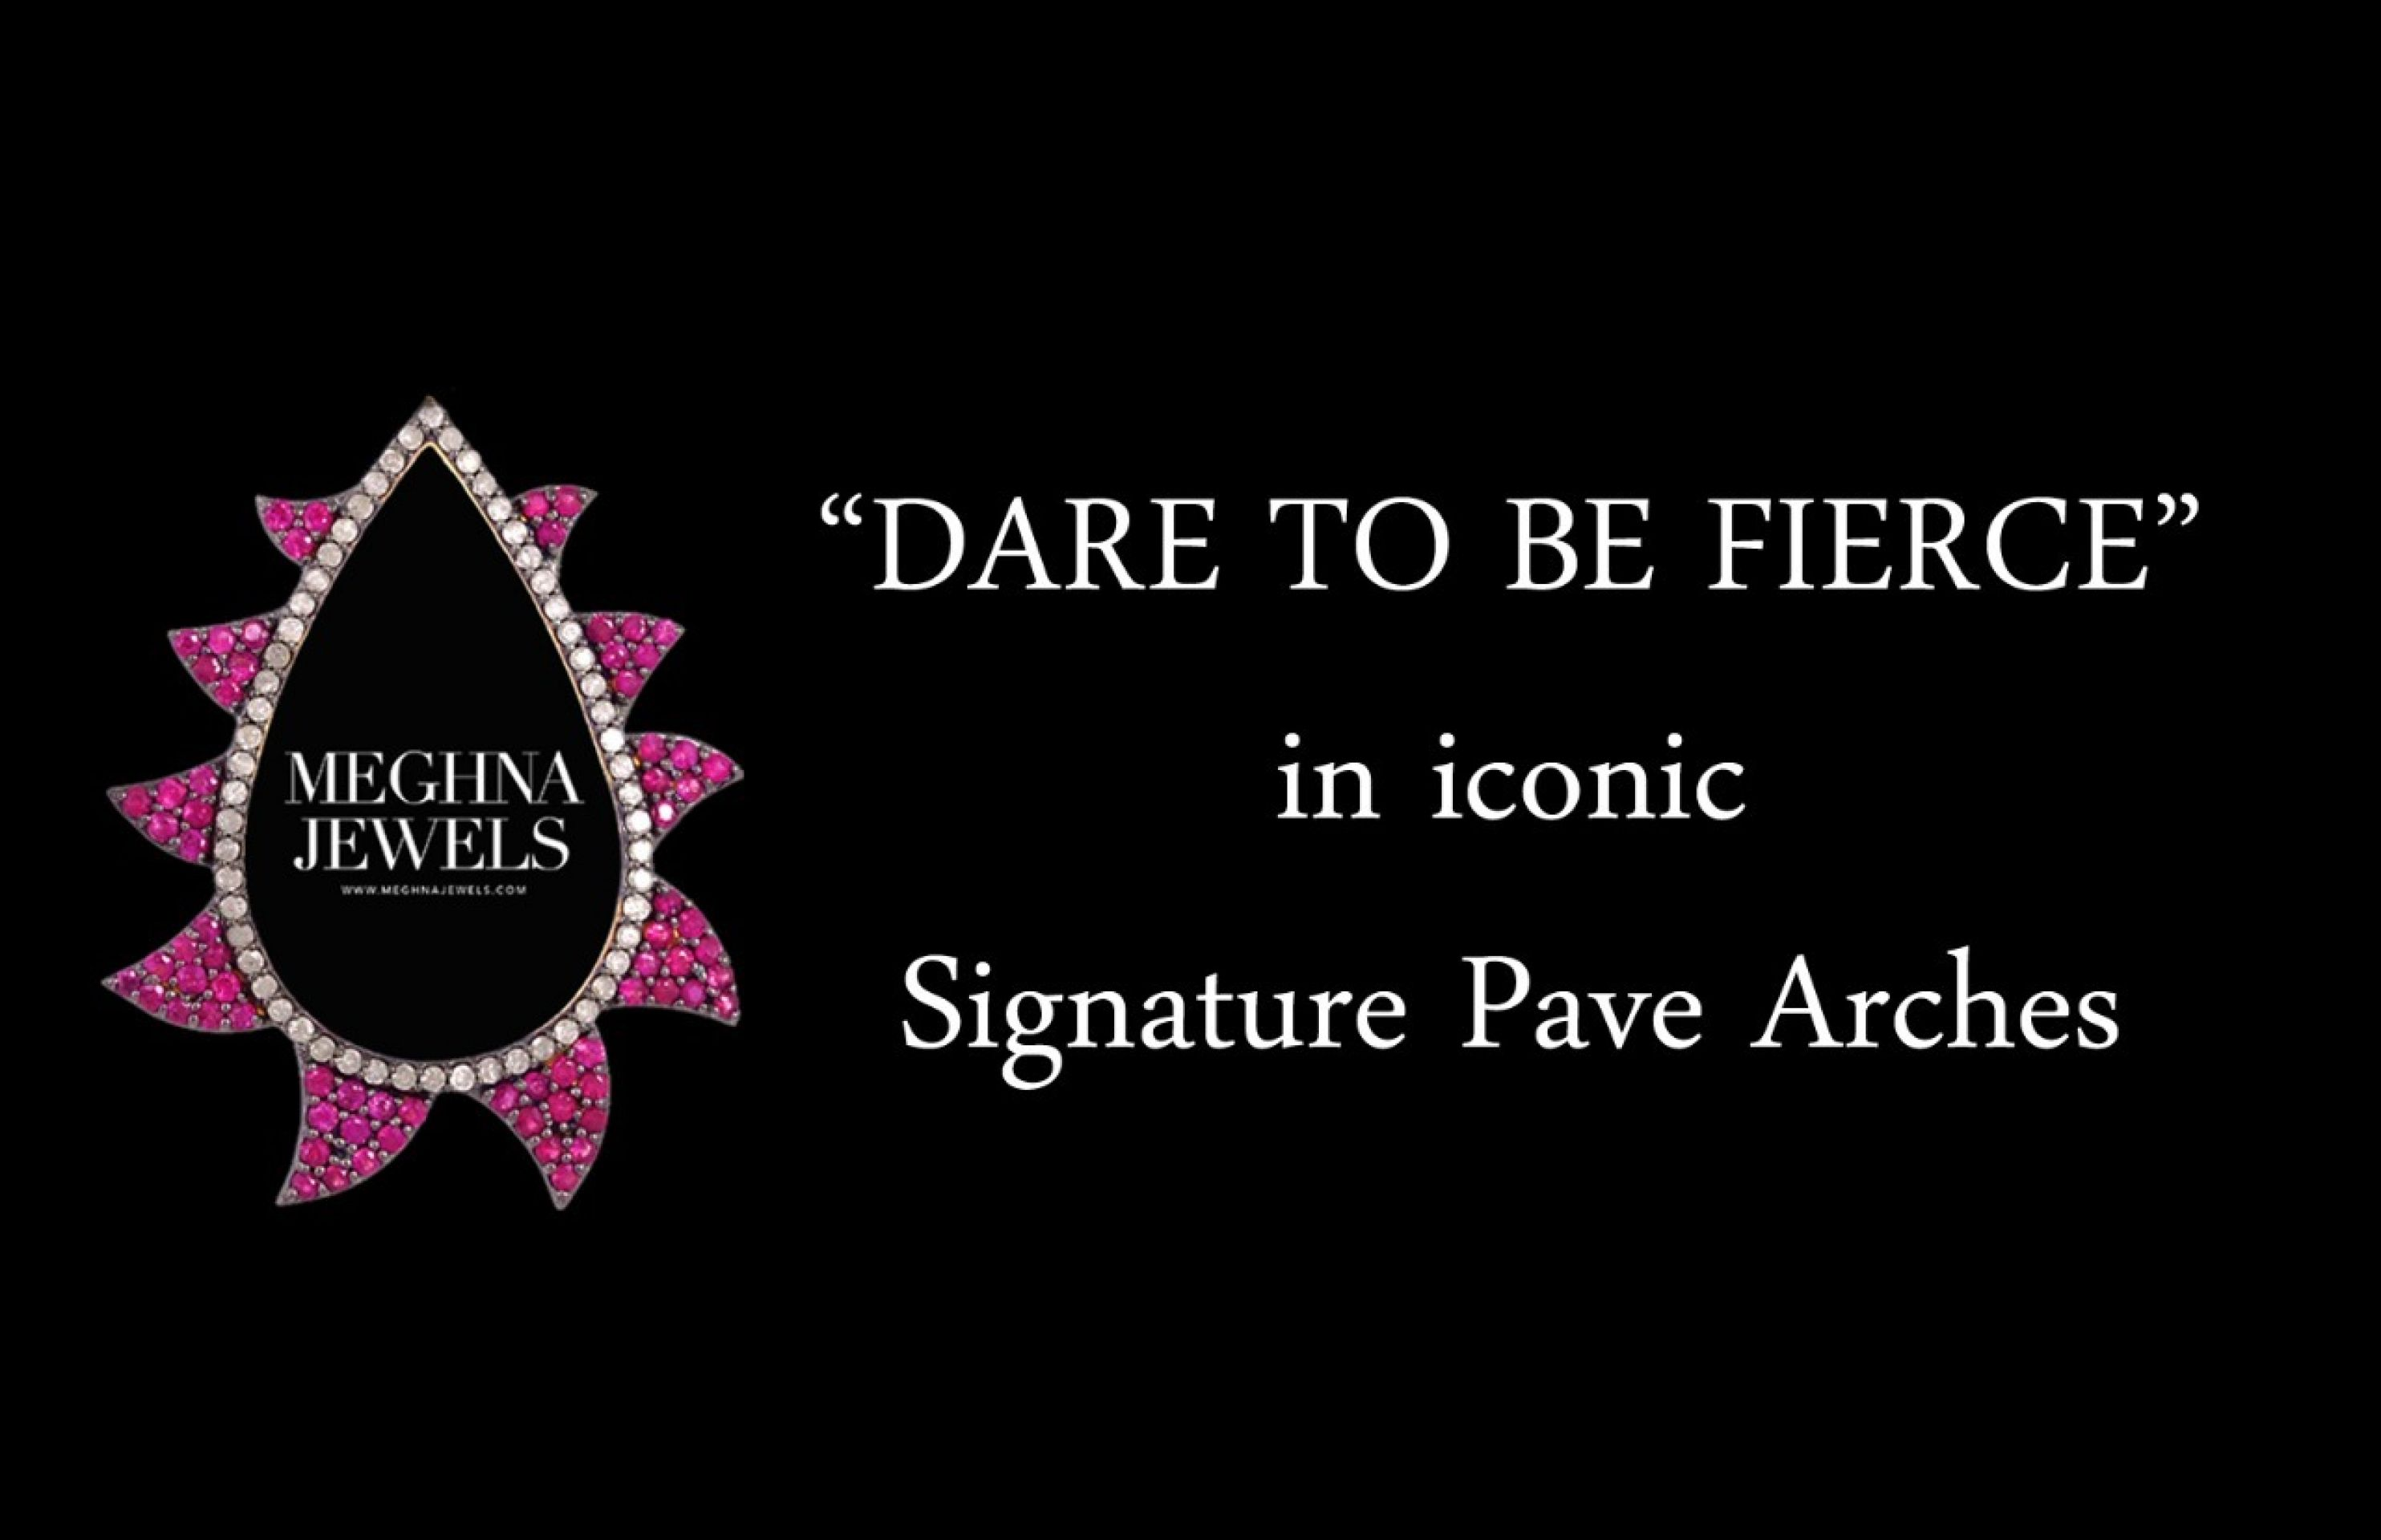 Meghna Jewels Double Drop Marquise Earring Black Onyx & Alt Diamonds